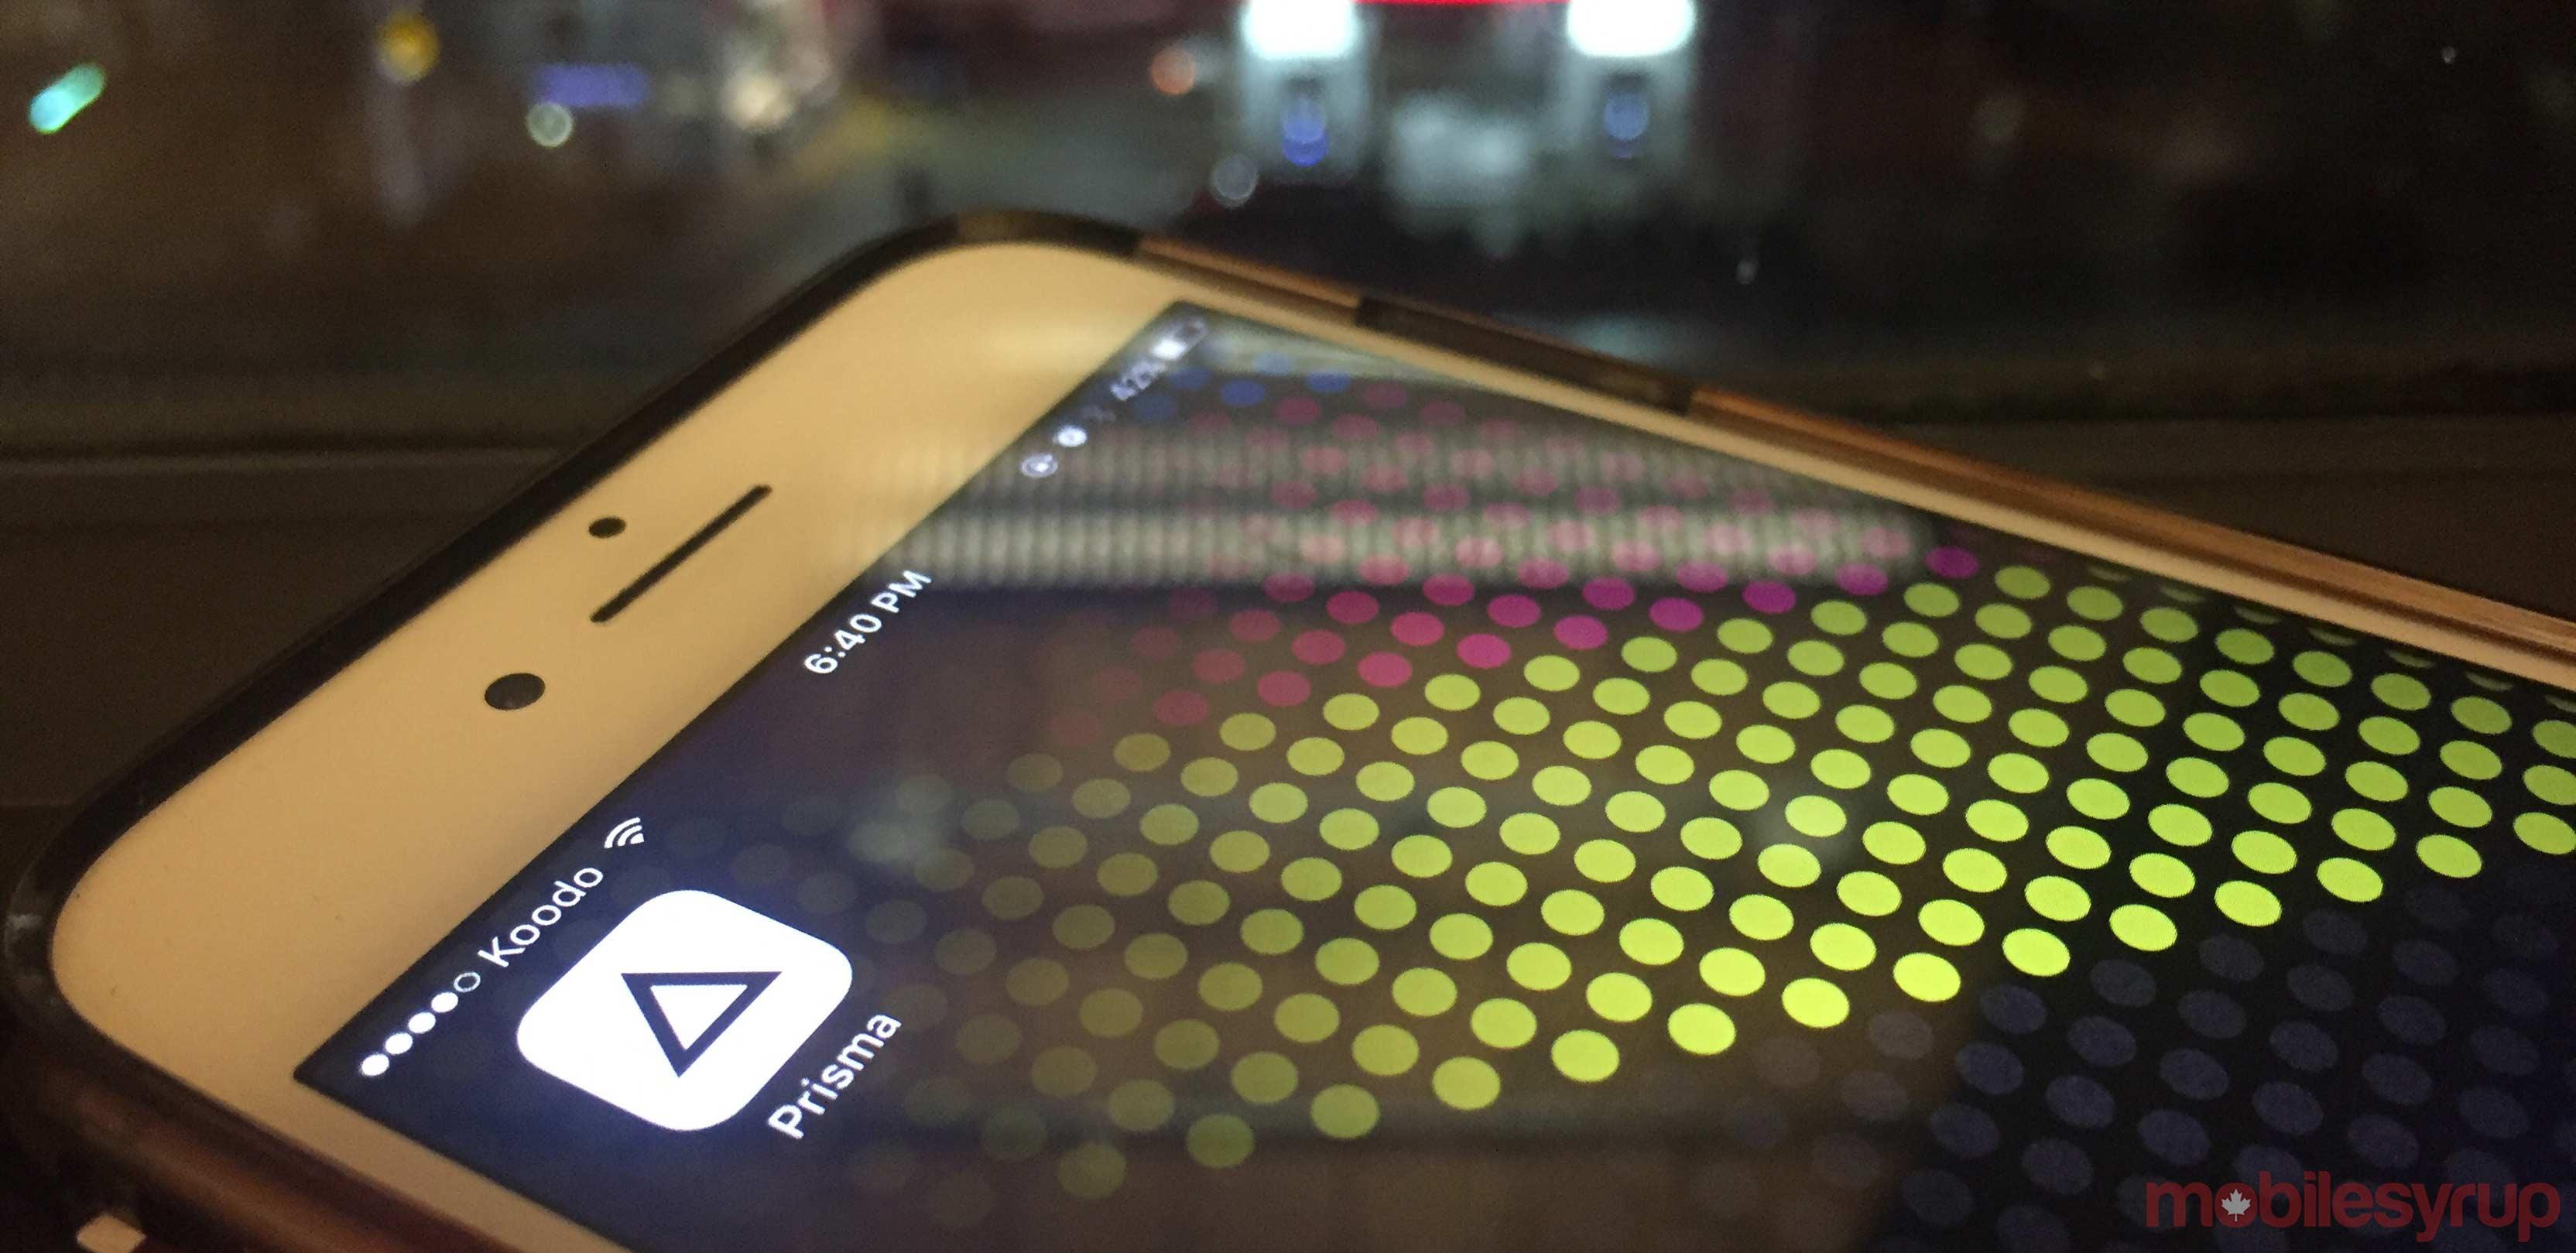 Prisma app on iPhone